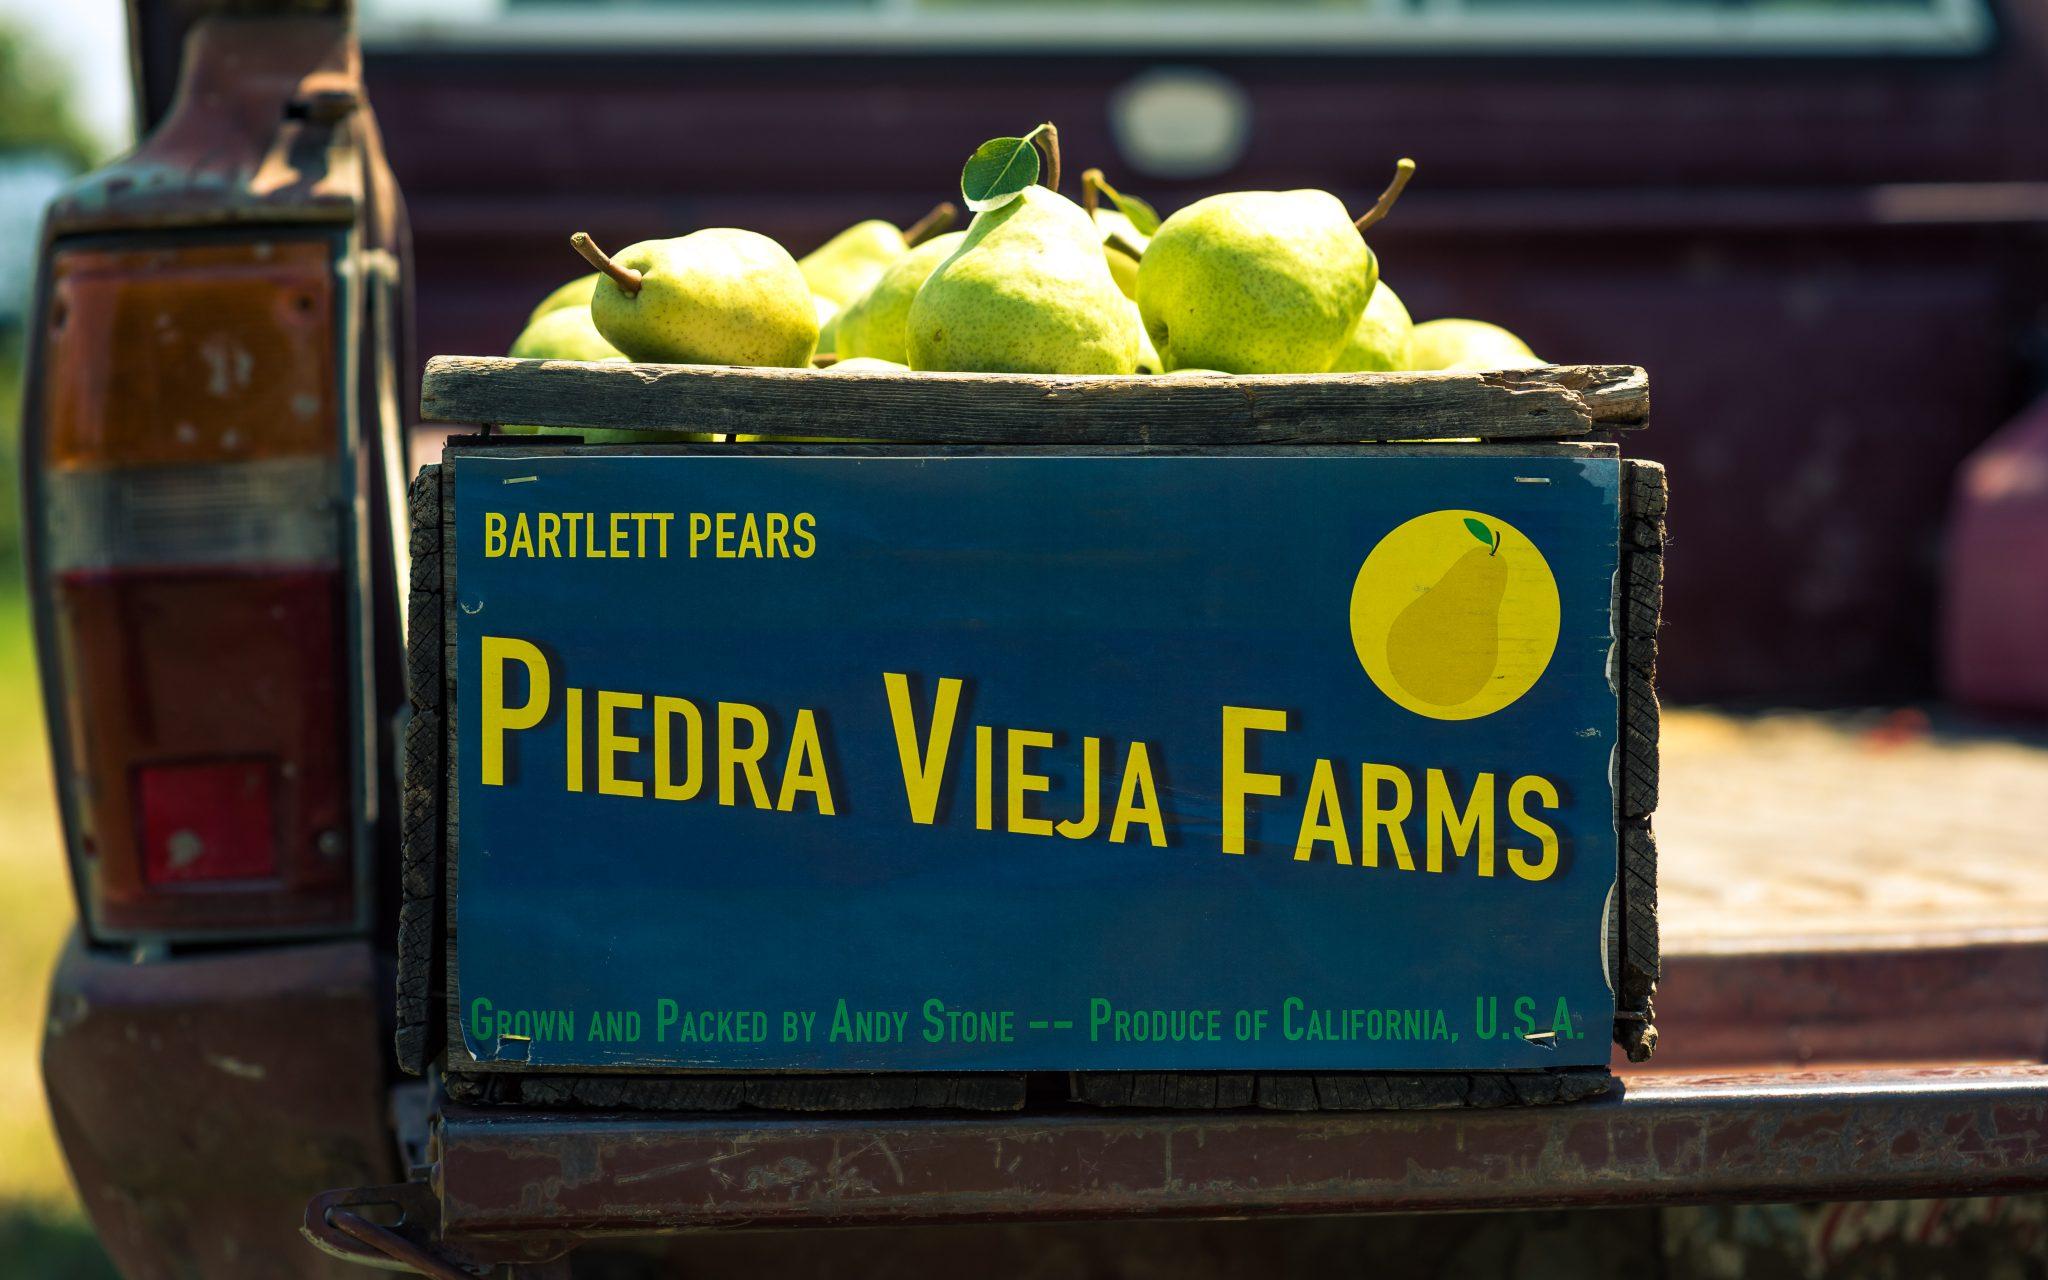 Piedra Vieja Farms Label